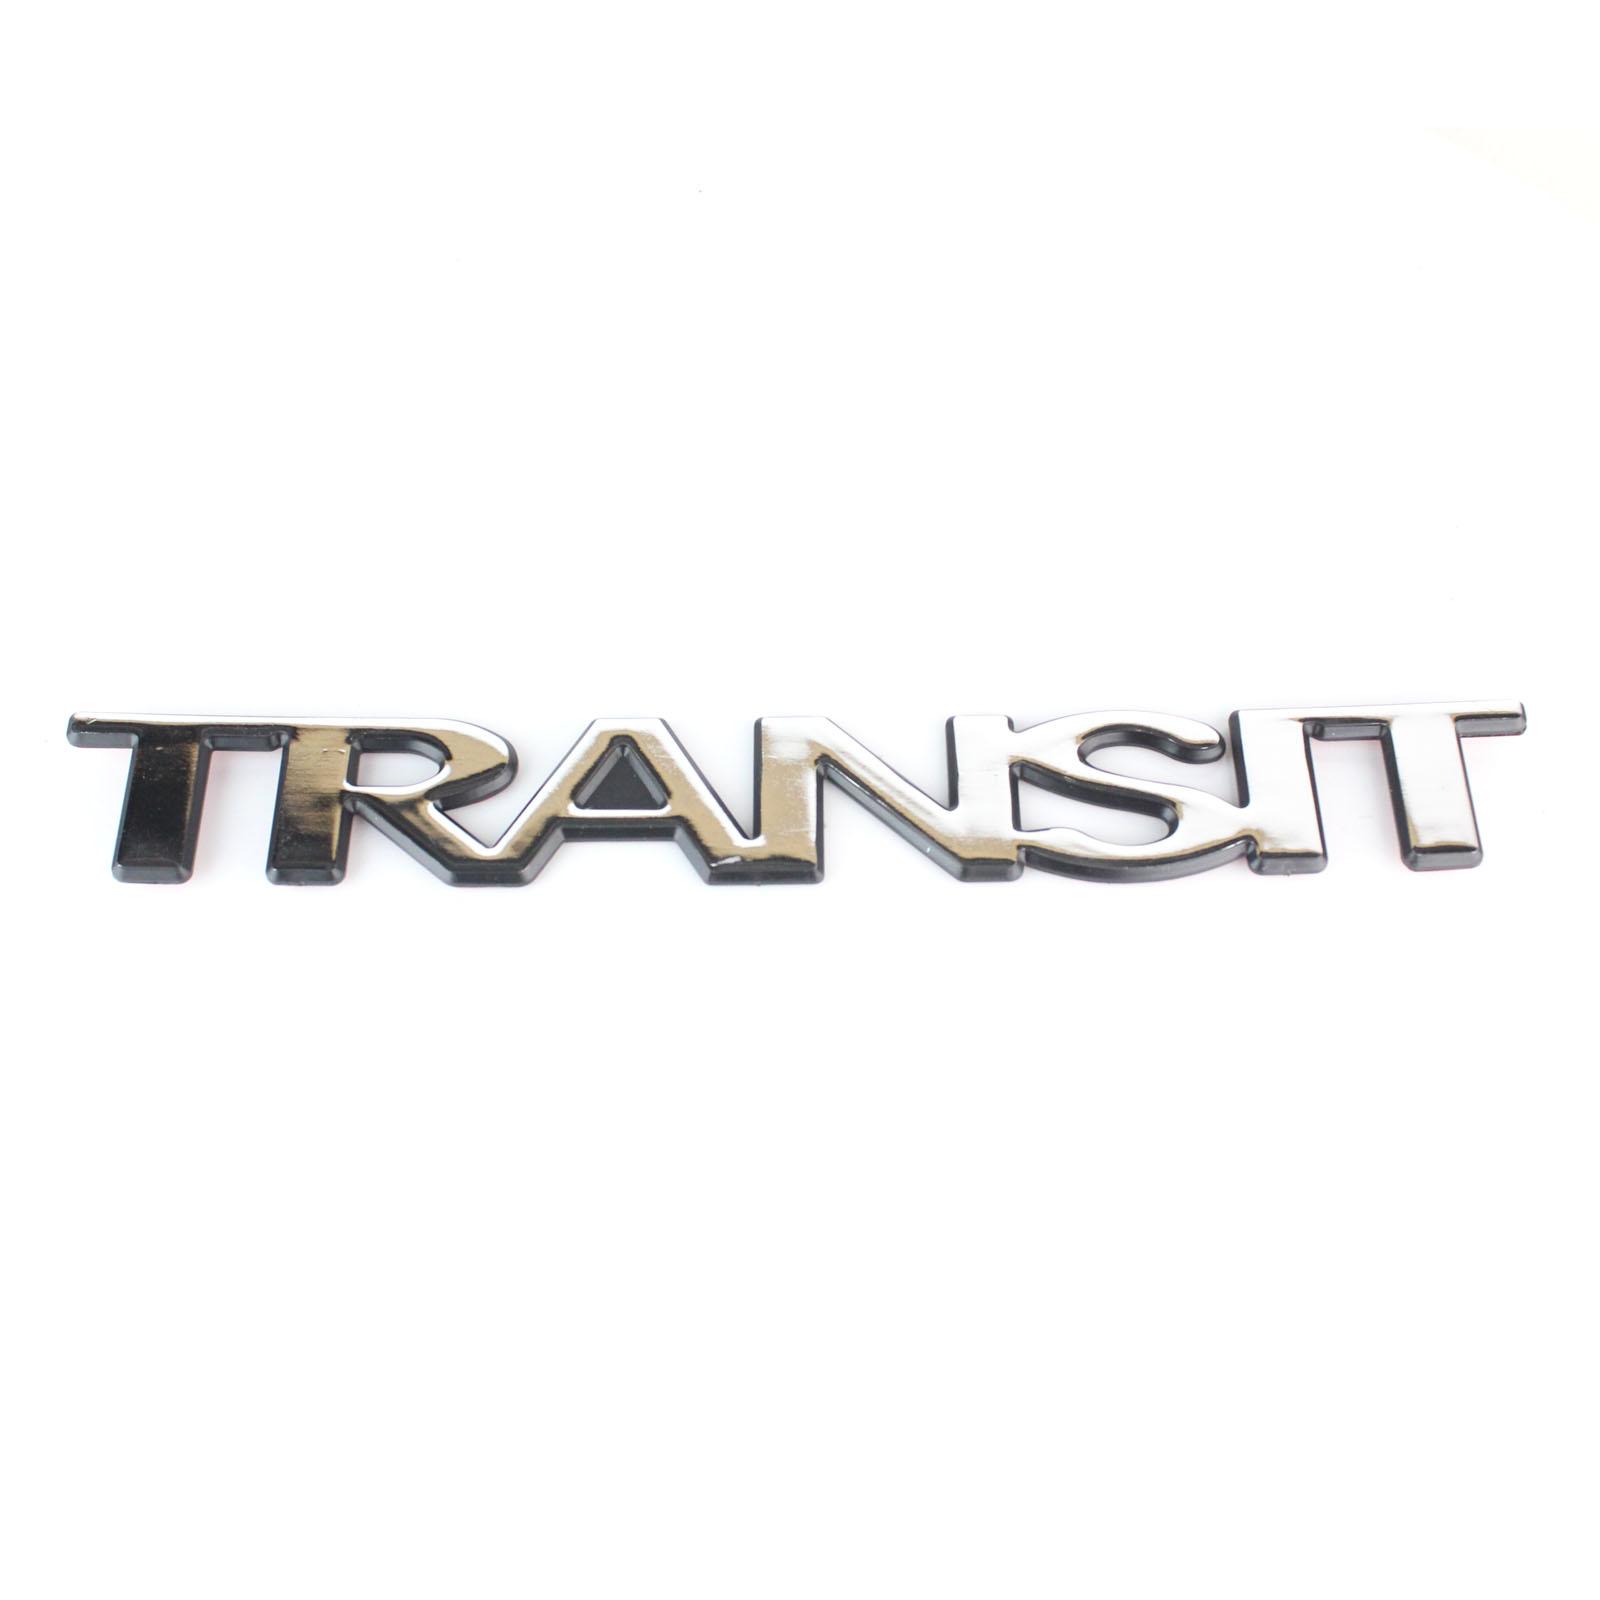 new ford transit logo name plate emblem sticker badge